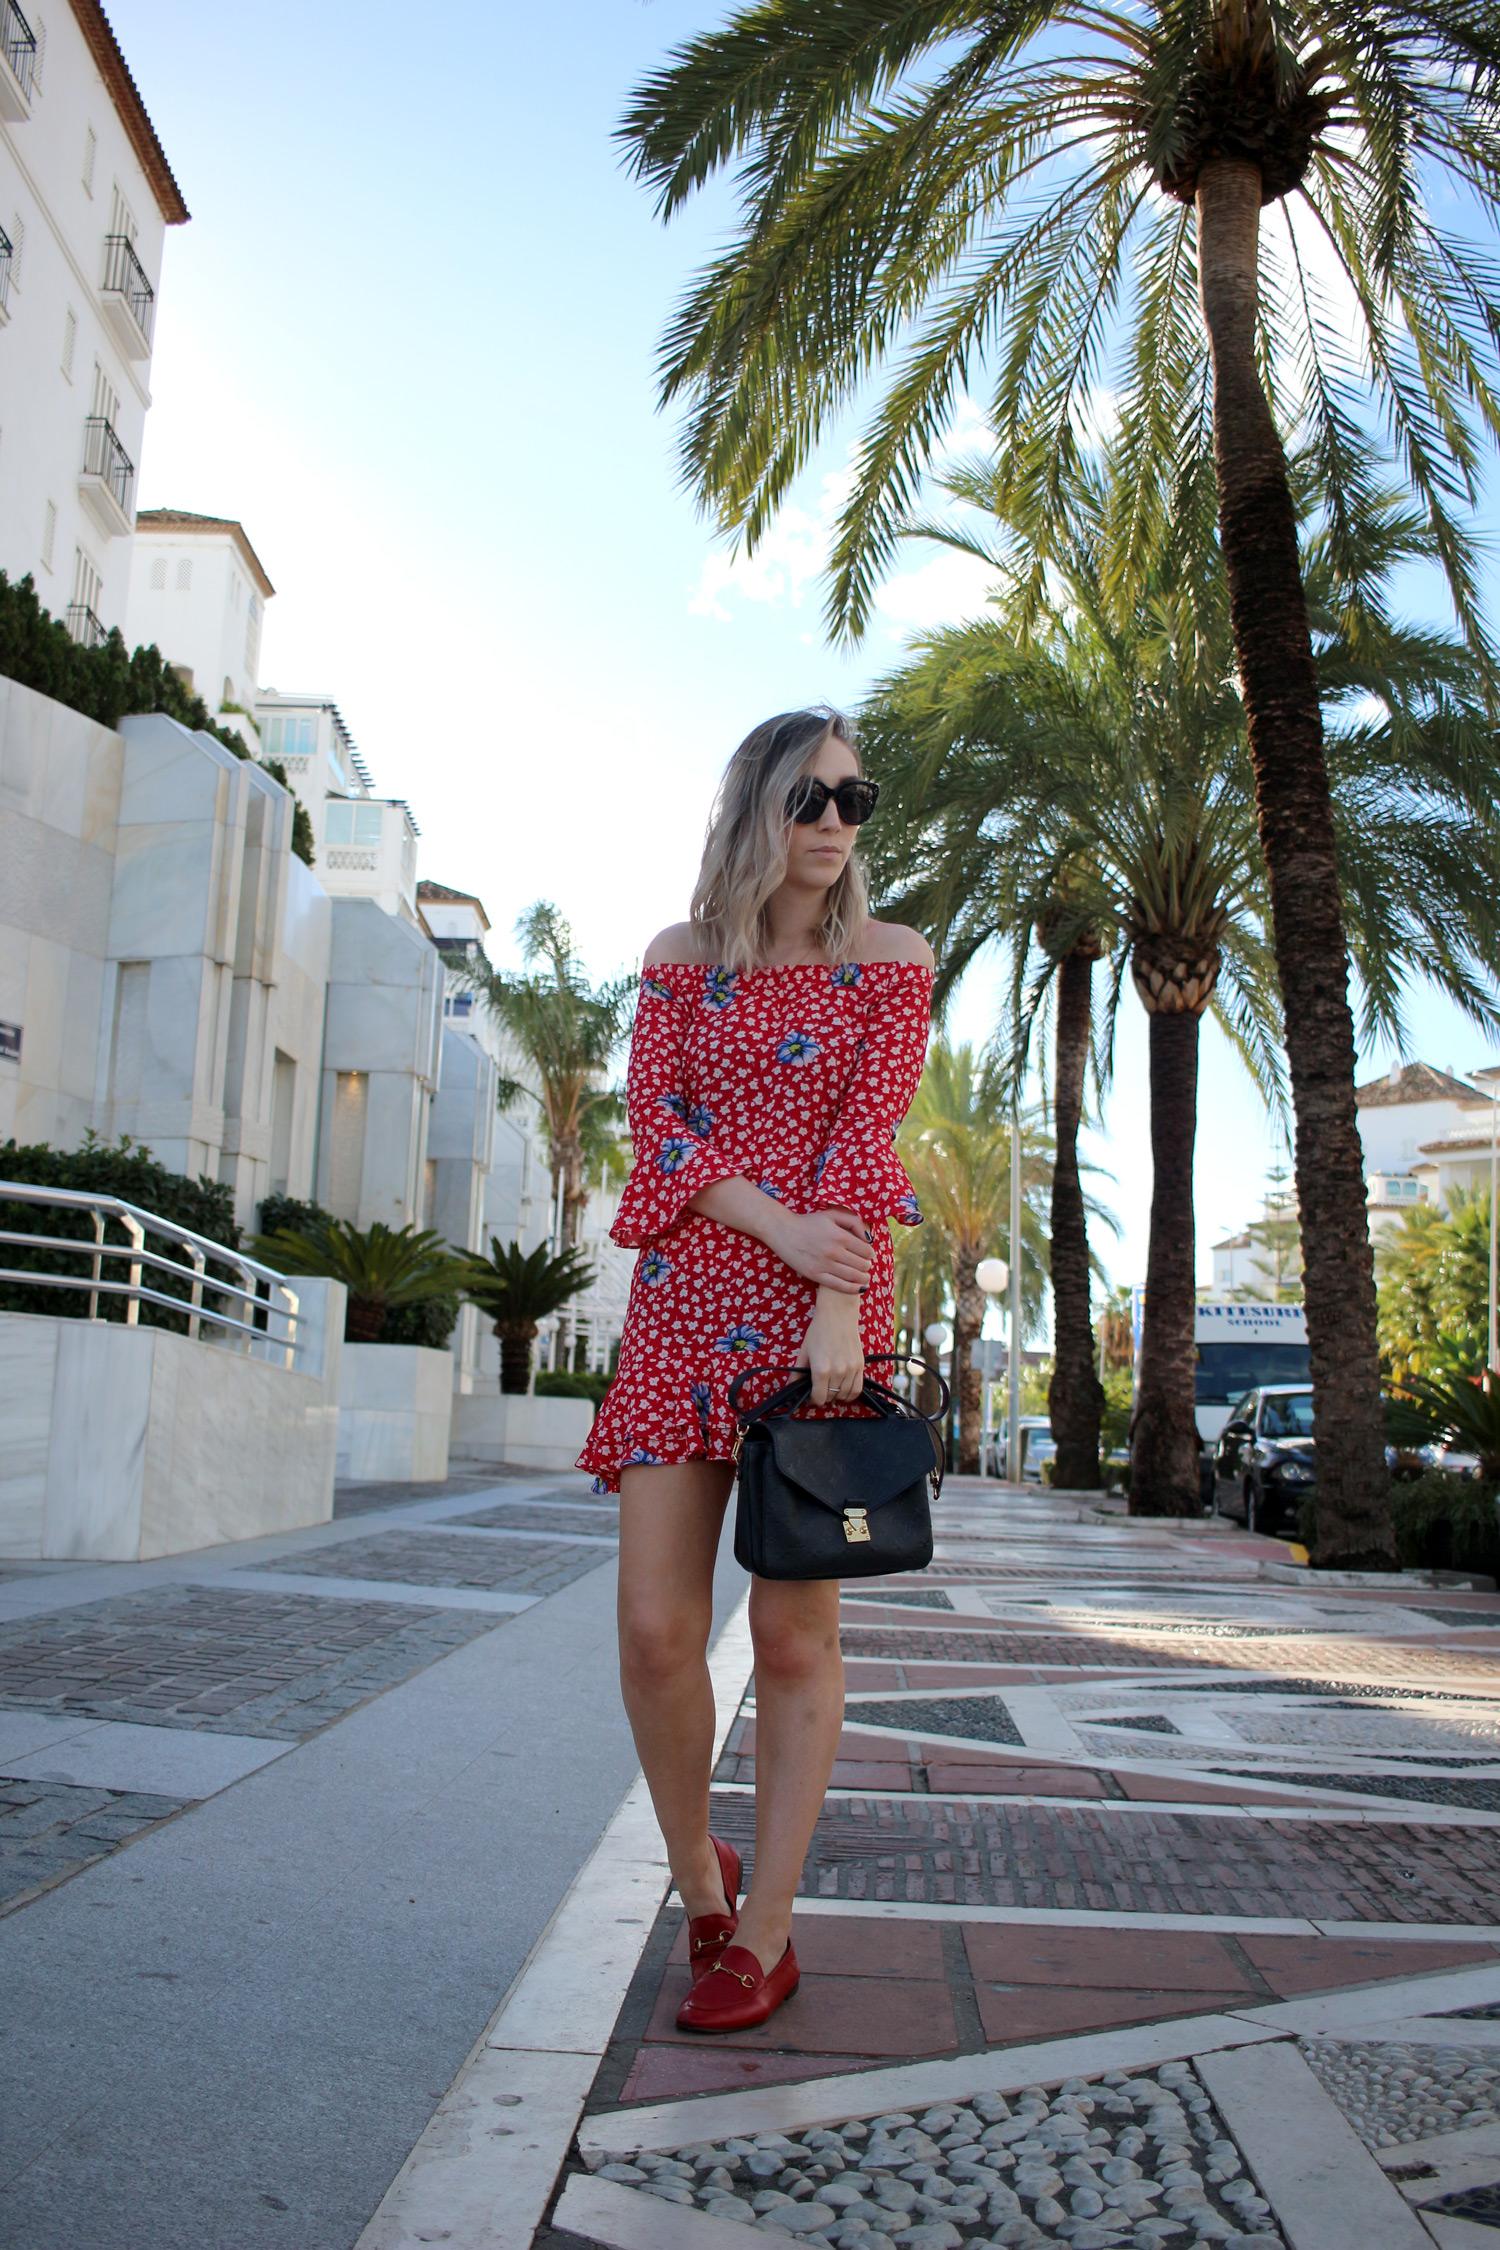 marbella-malaga-spain-travel-blogger-Puerto-Banus-1